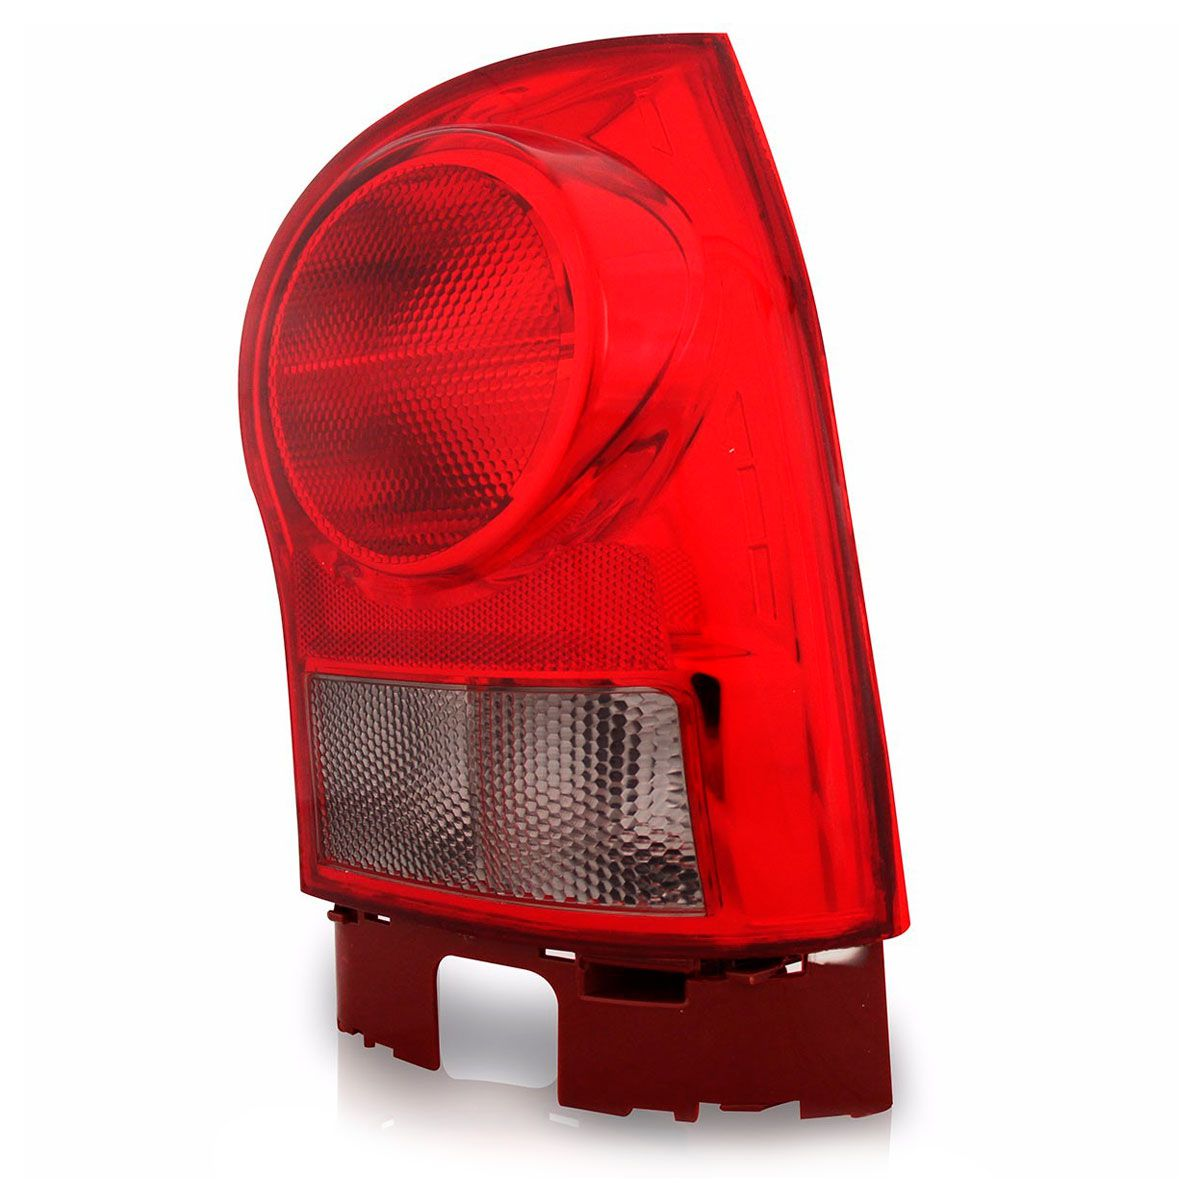 Lanterna Traseira Vw Gol G4 2006 a 2014 Ré Fumê Lado Direito 33050FD  - AutoParts Online